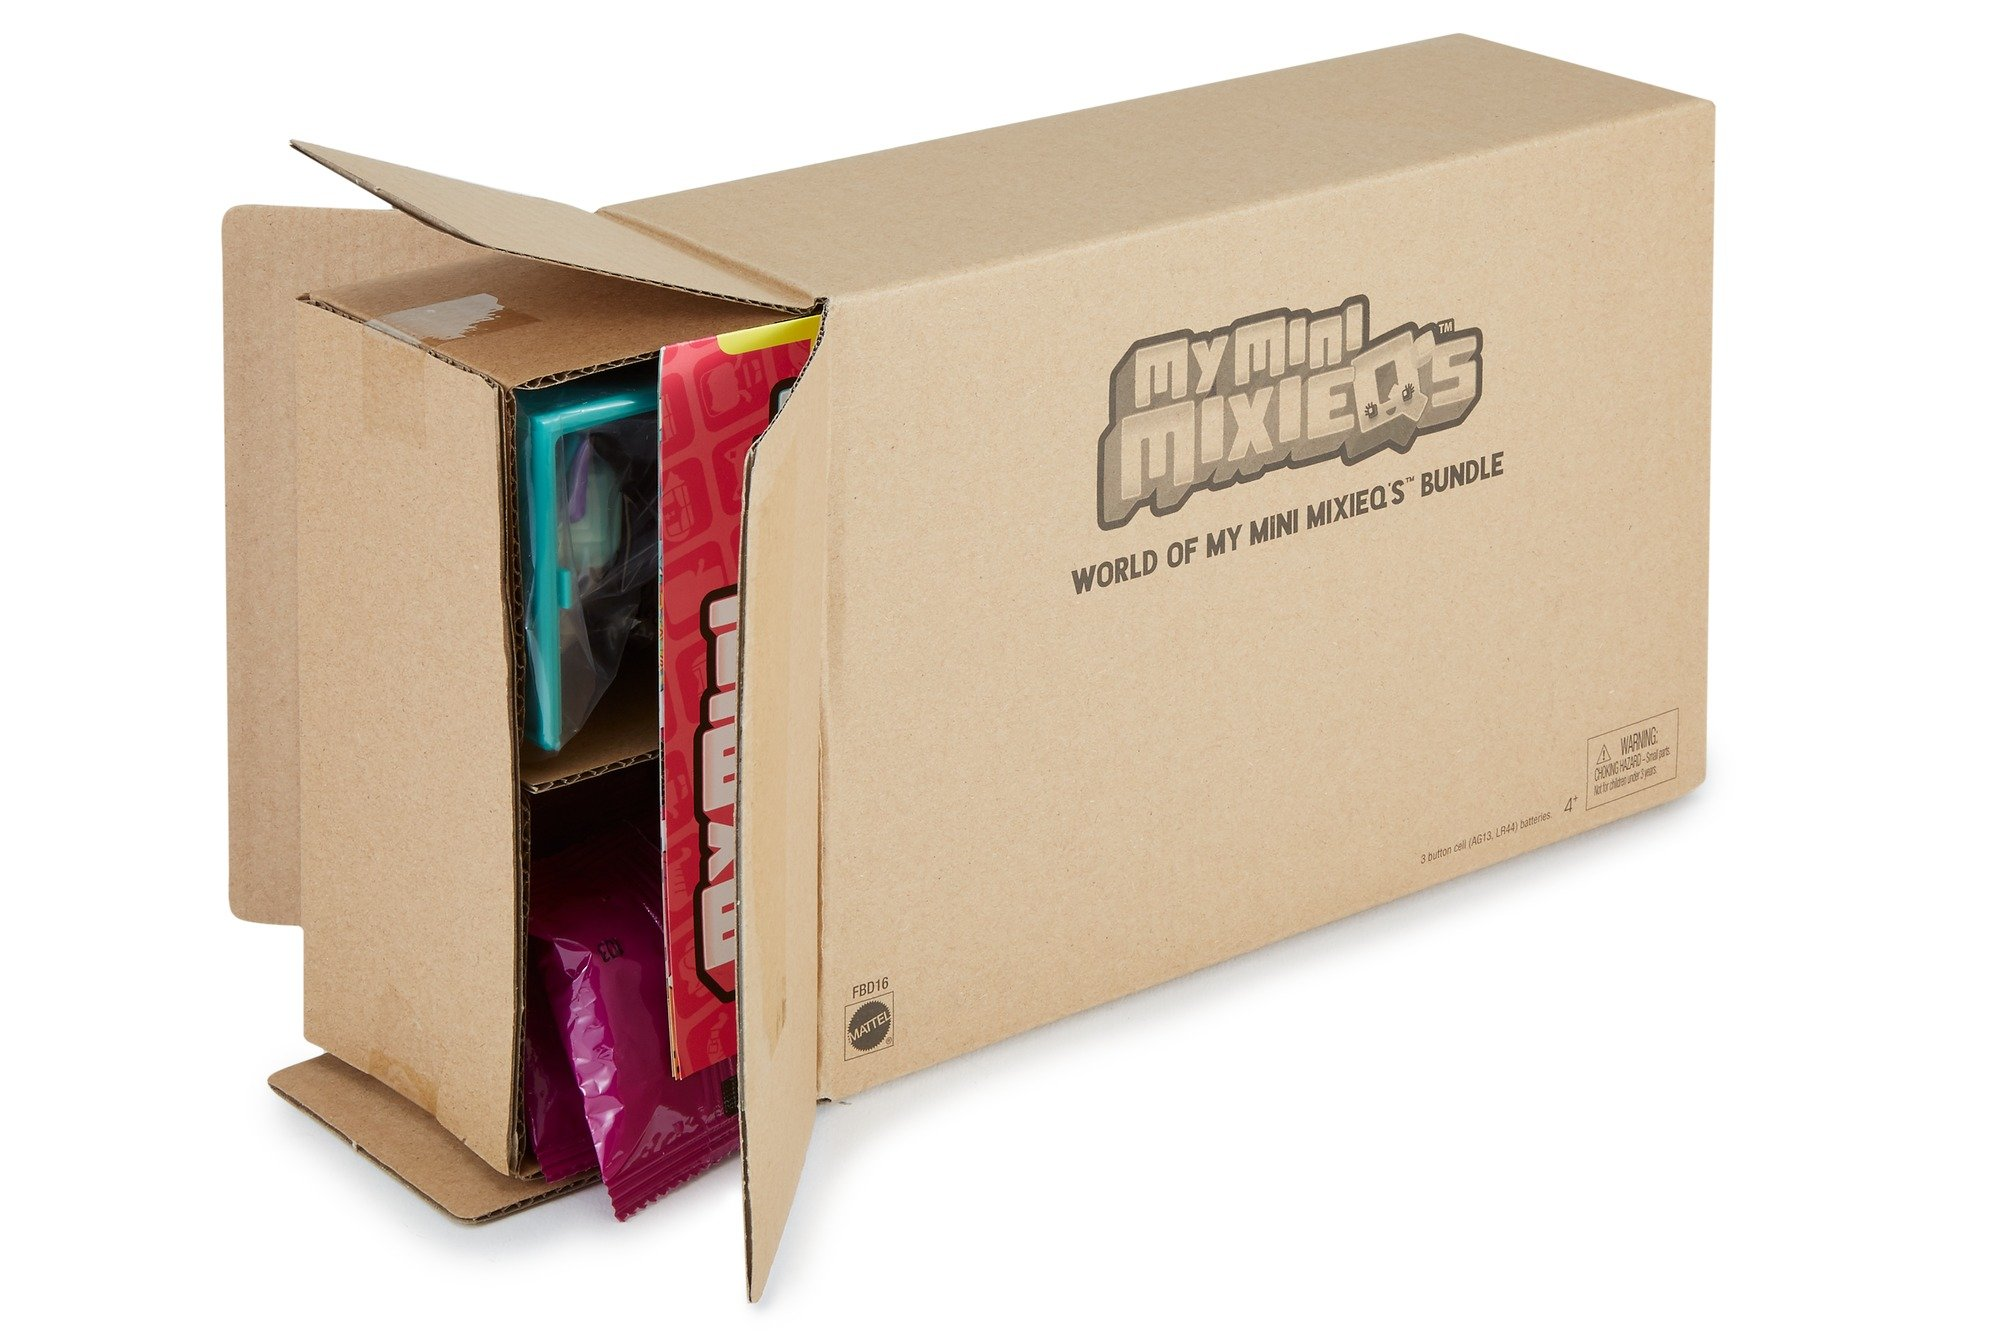 My Mini MixieQ's Bundle - Mini Rooms, Playsets, and Figures by My Mini MixieQ's (Image #8)